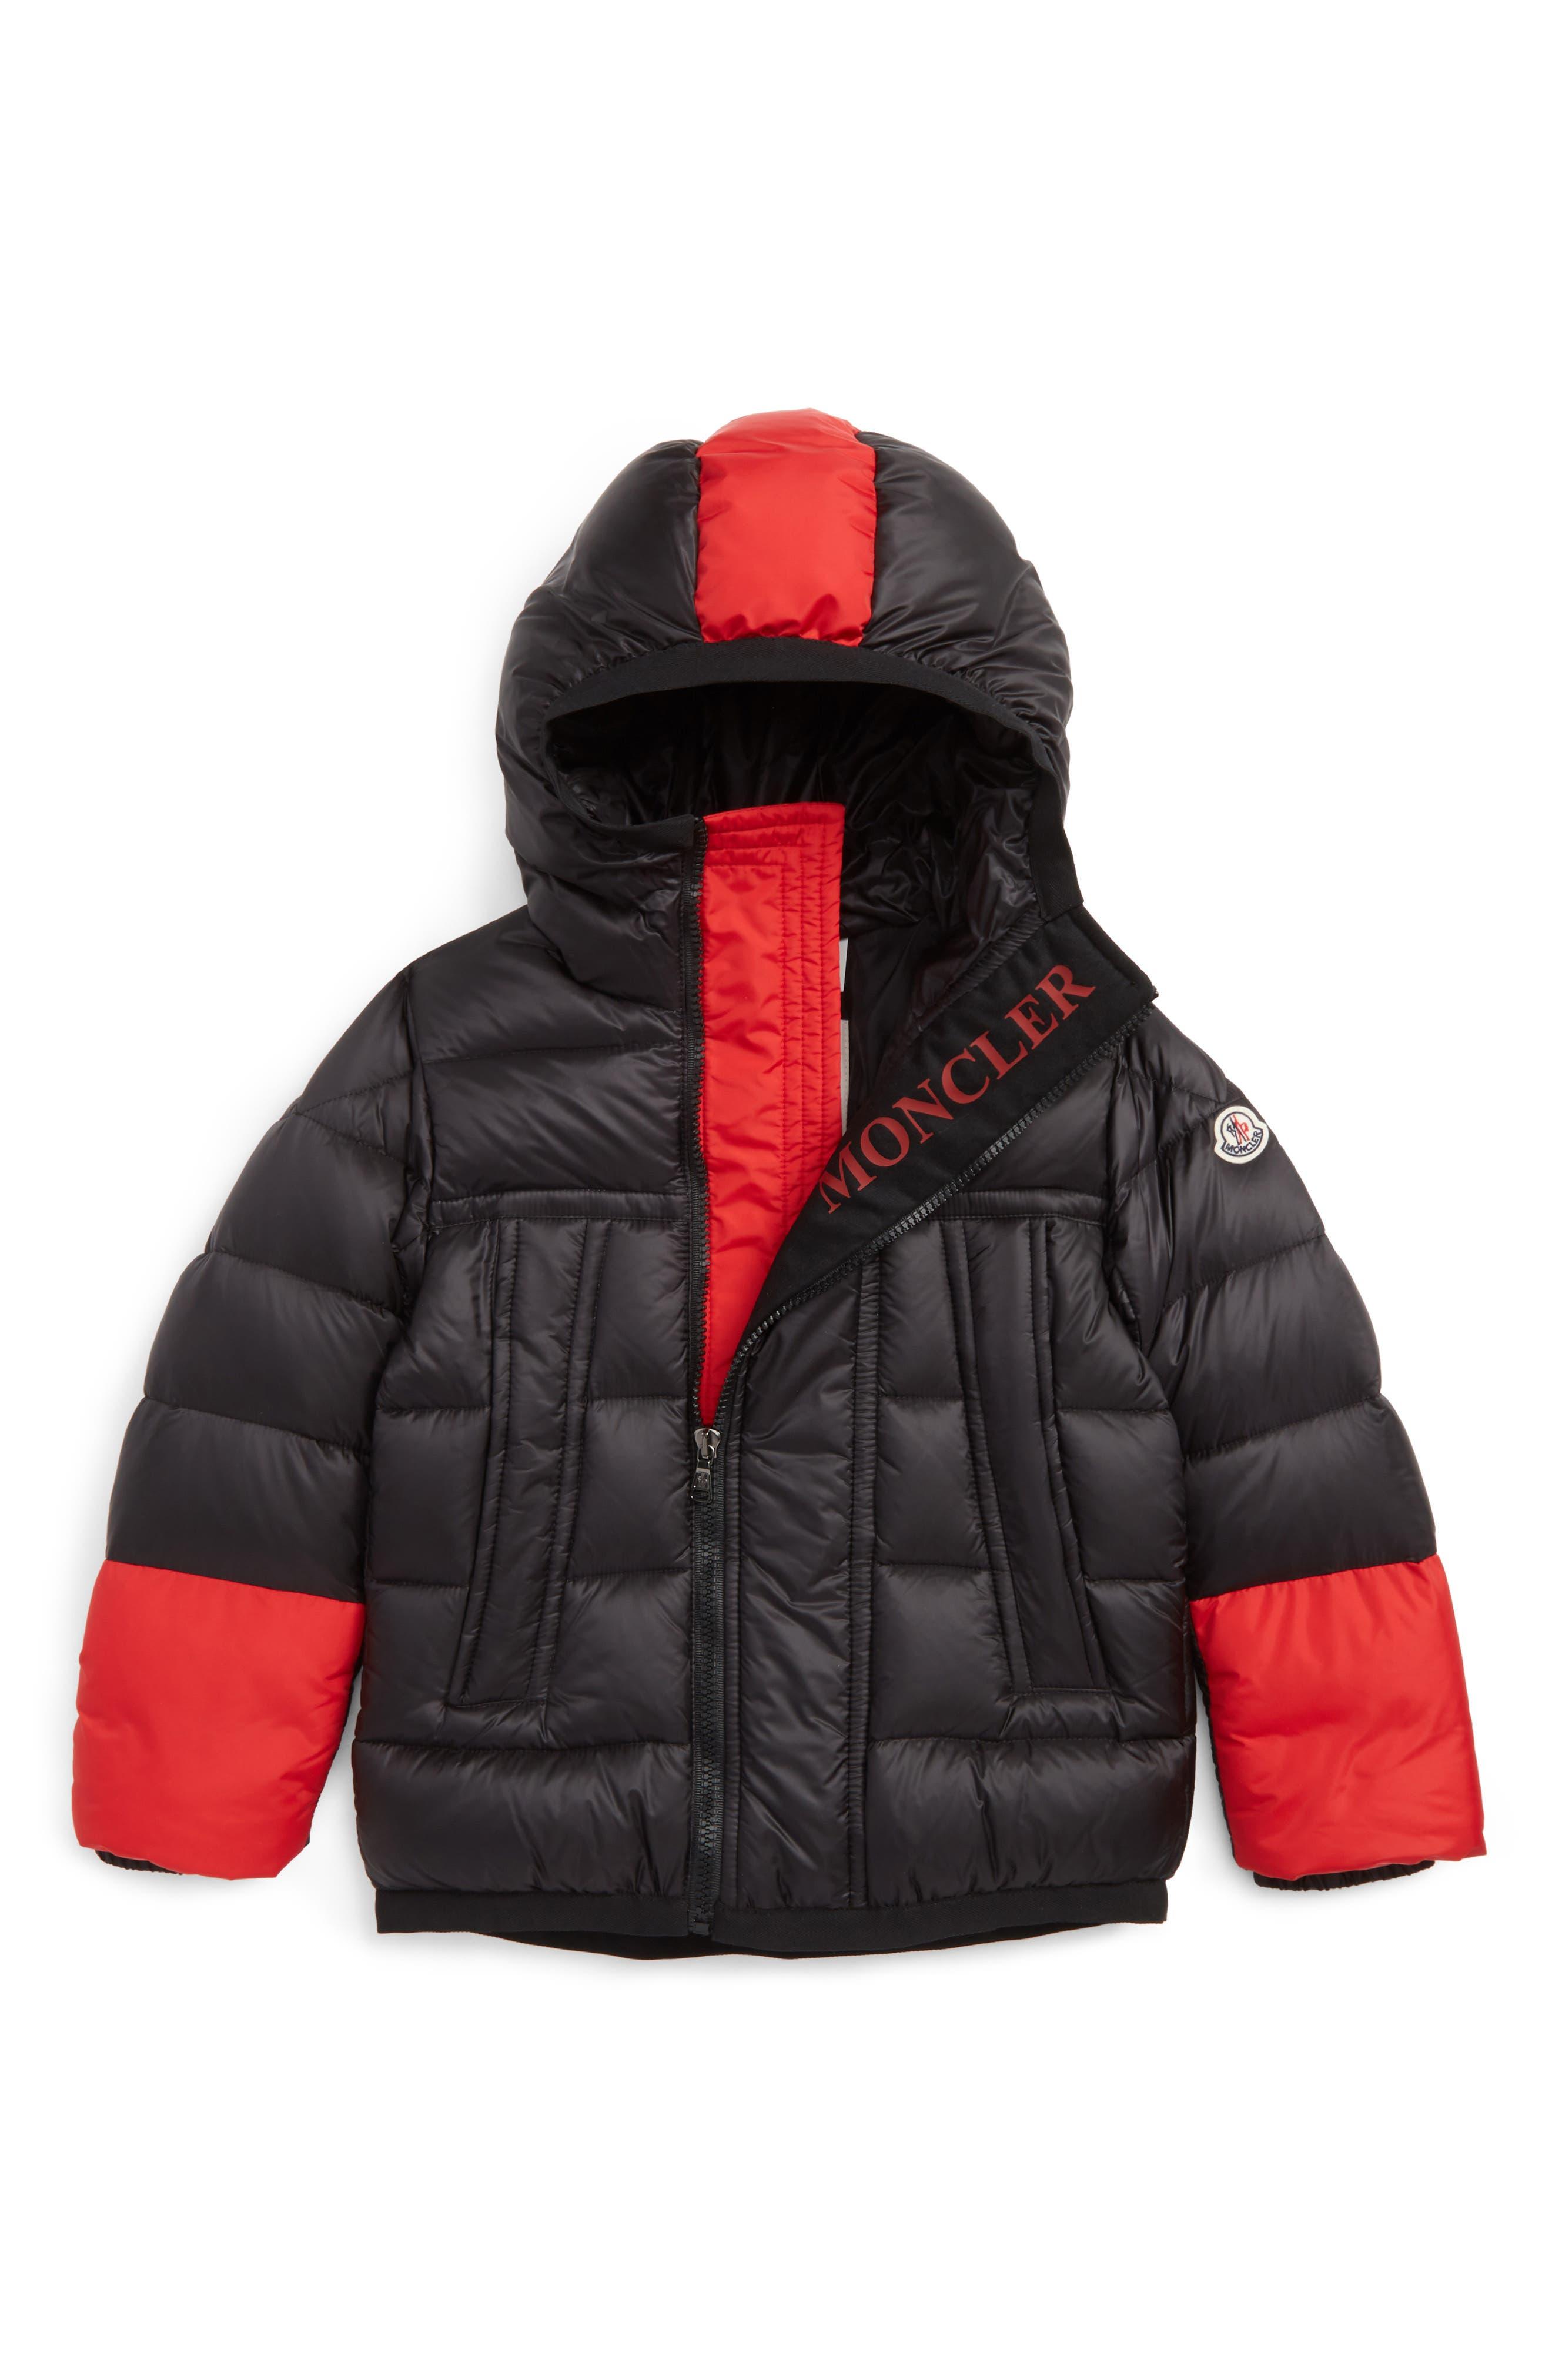 Alternate Image 1 Selected - Moncler Drake Hooded Down Coat (Toddler Boys, Little Boys & Big Boys)